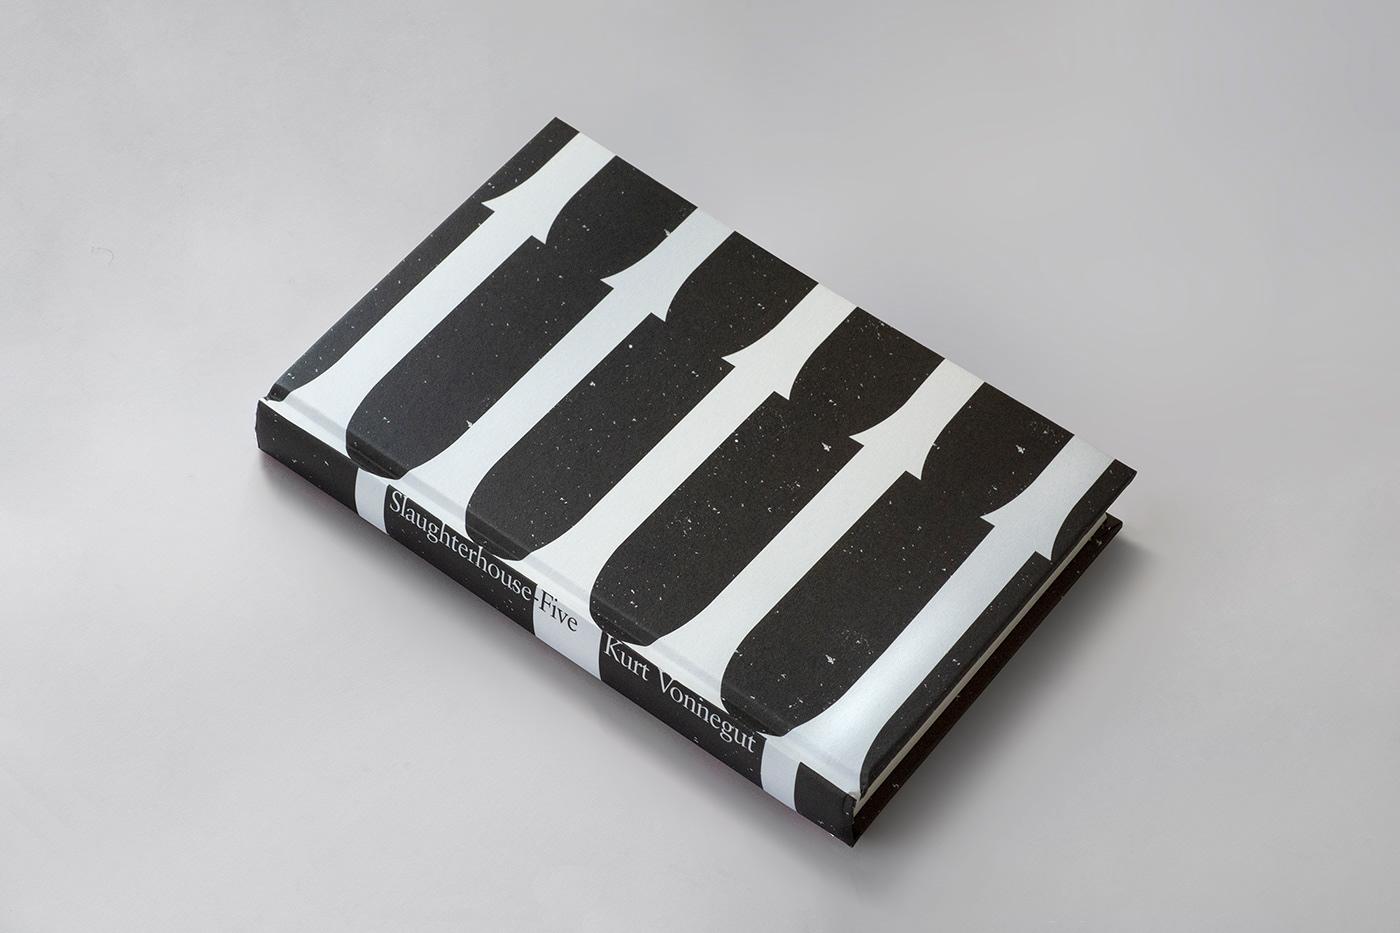 book graphic kurtvonnegut print Slaughterhouse-Five